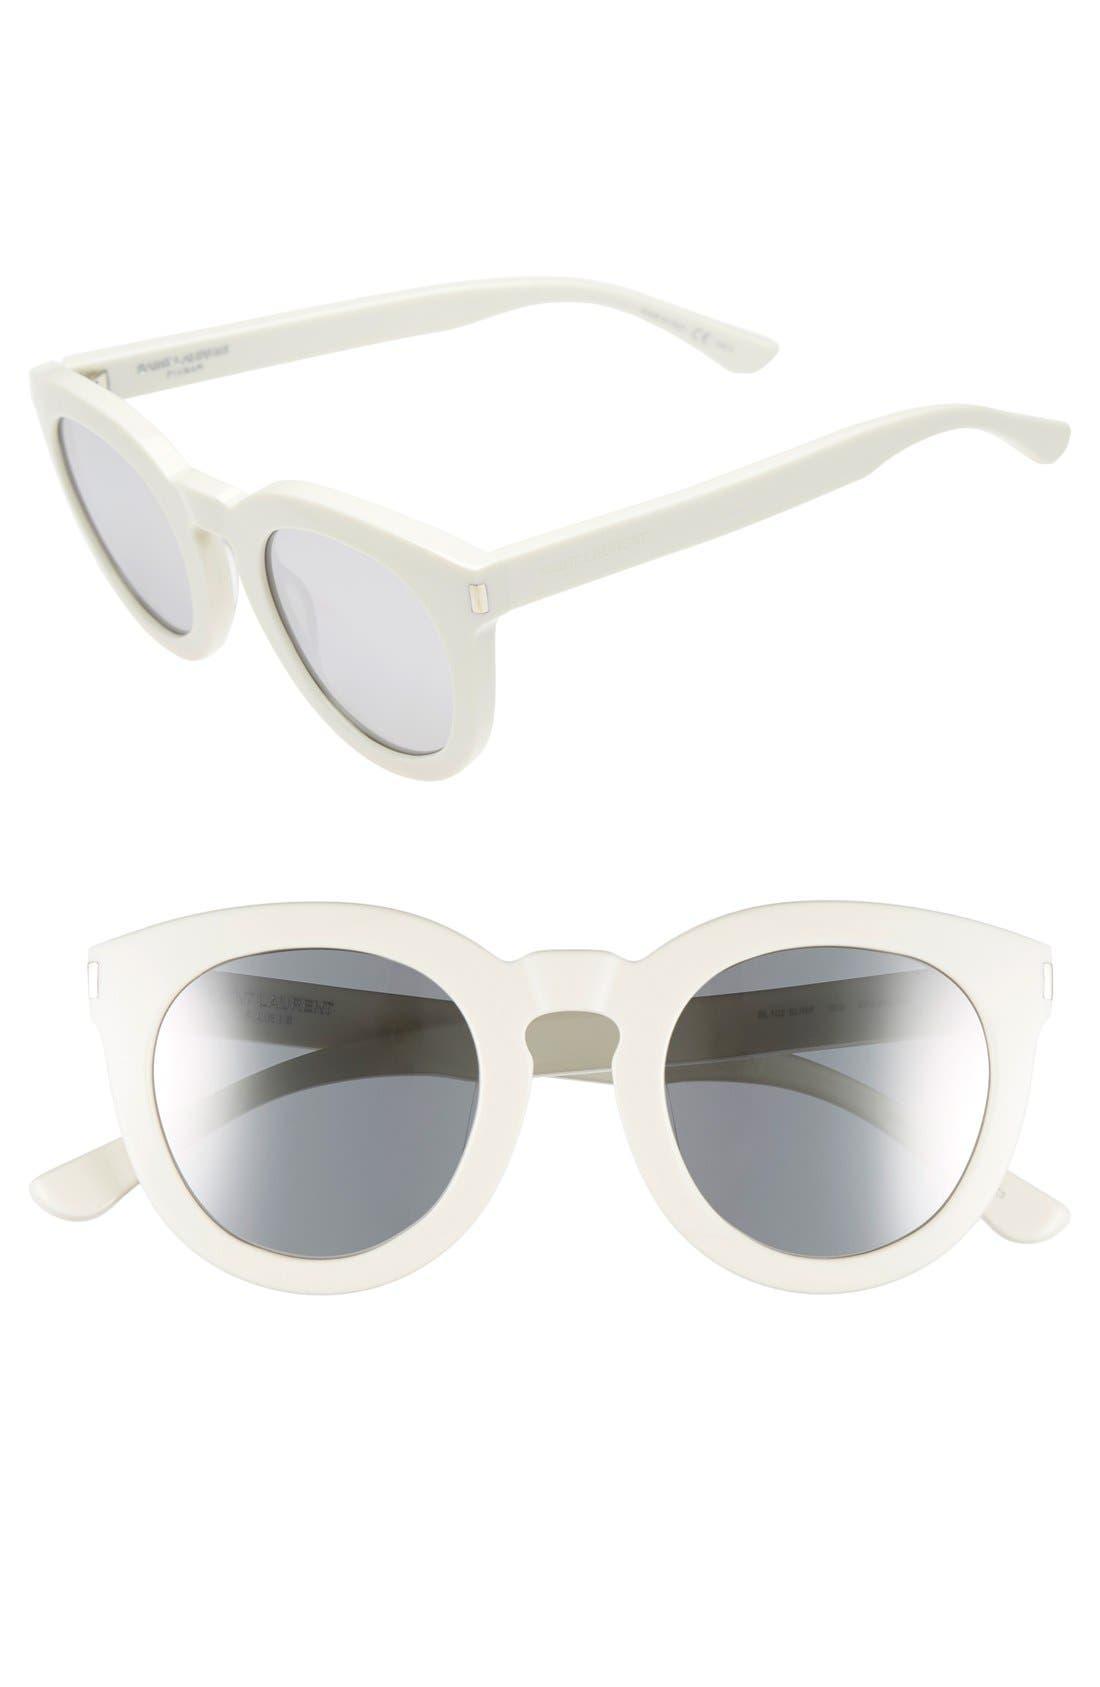 Alternate Image 1 Selected - Saint Laurent '102 Surf' 47mm Retro Sunglasses